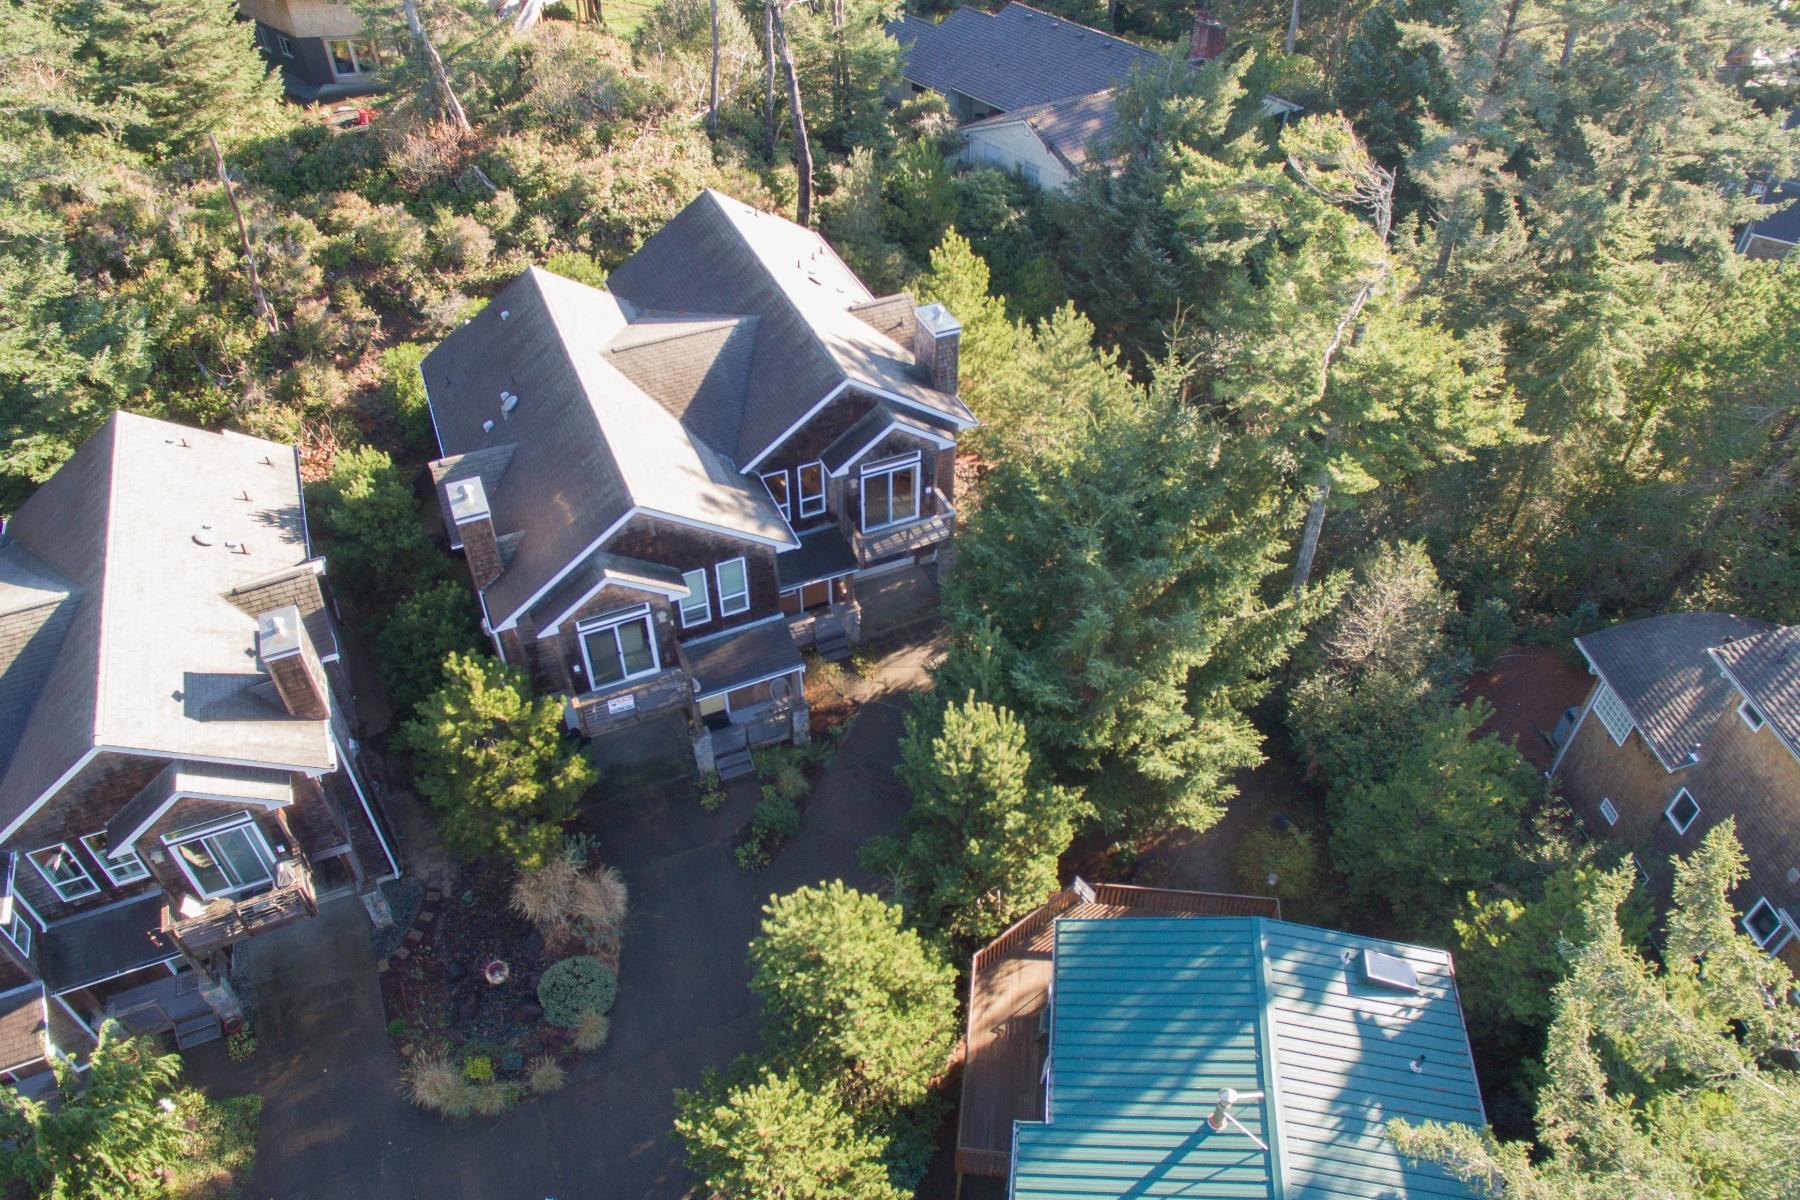 Condominium for Sale at 386 FIRST ST, MANZANITA Manzanita, Oregon, 97130 United States